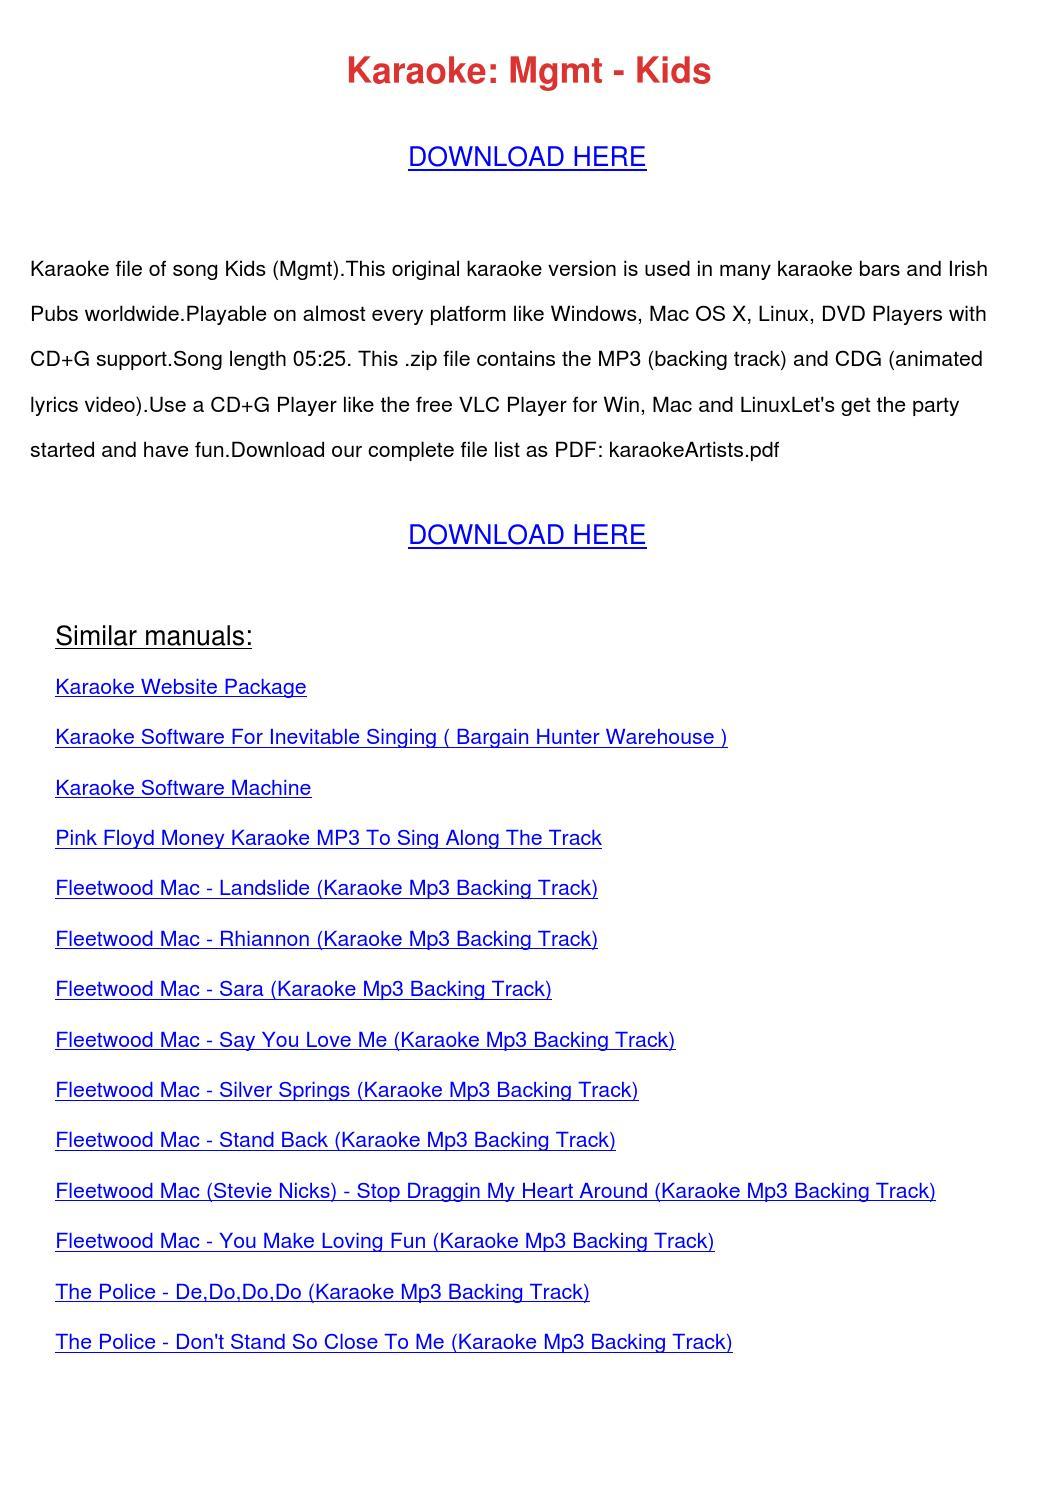 Karaoke Mgmt Kids by NikoleNunley - issuu